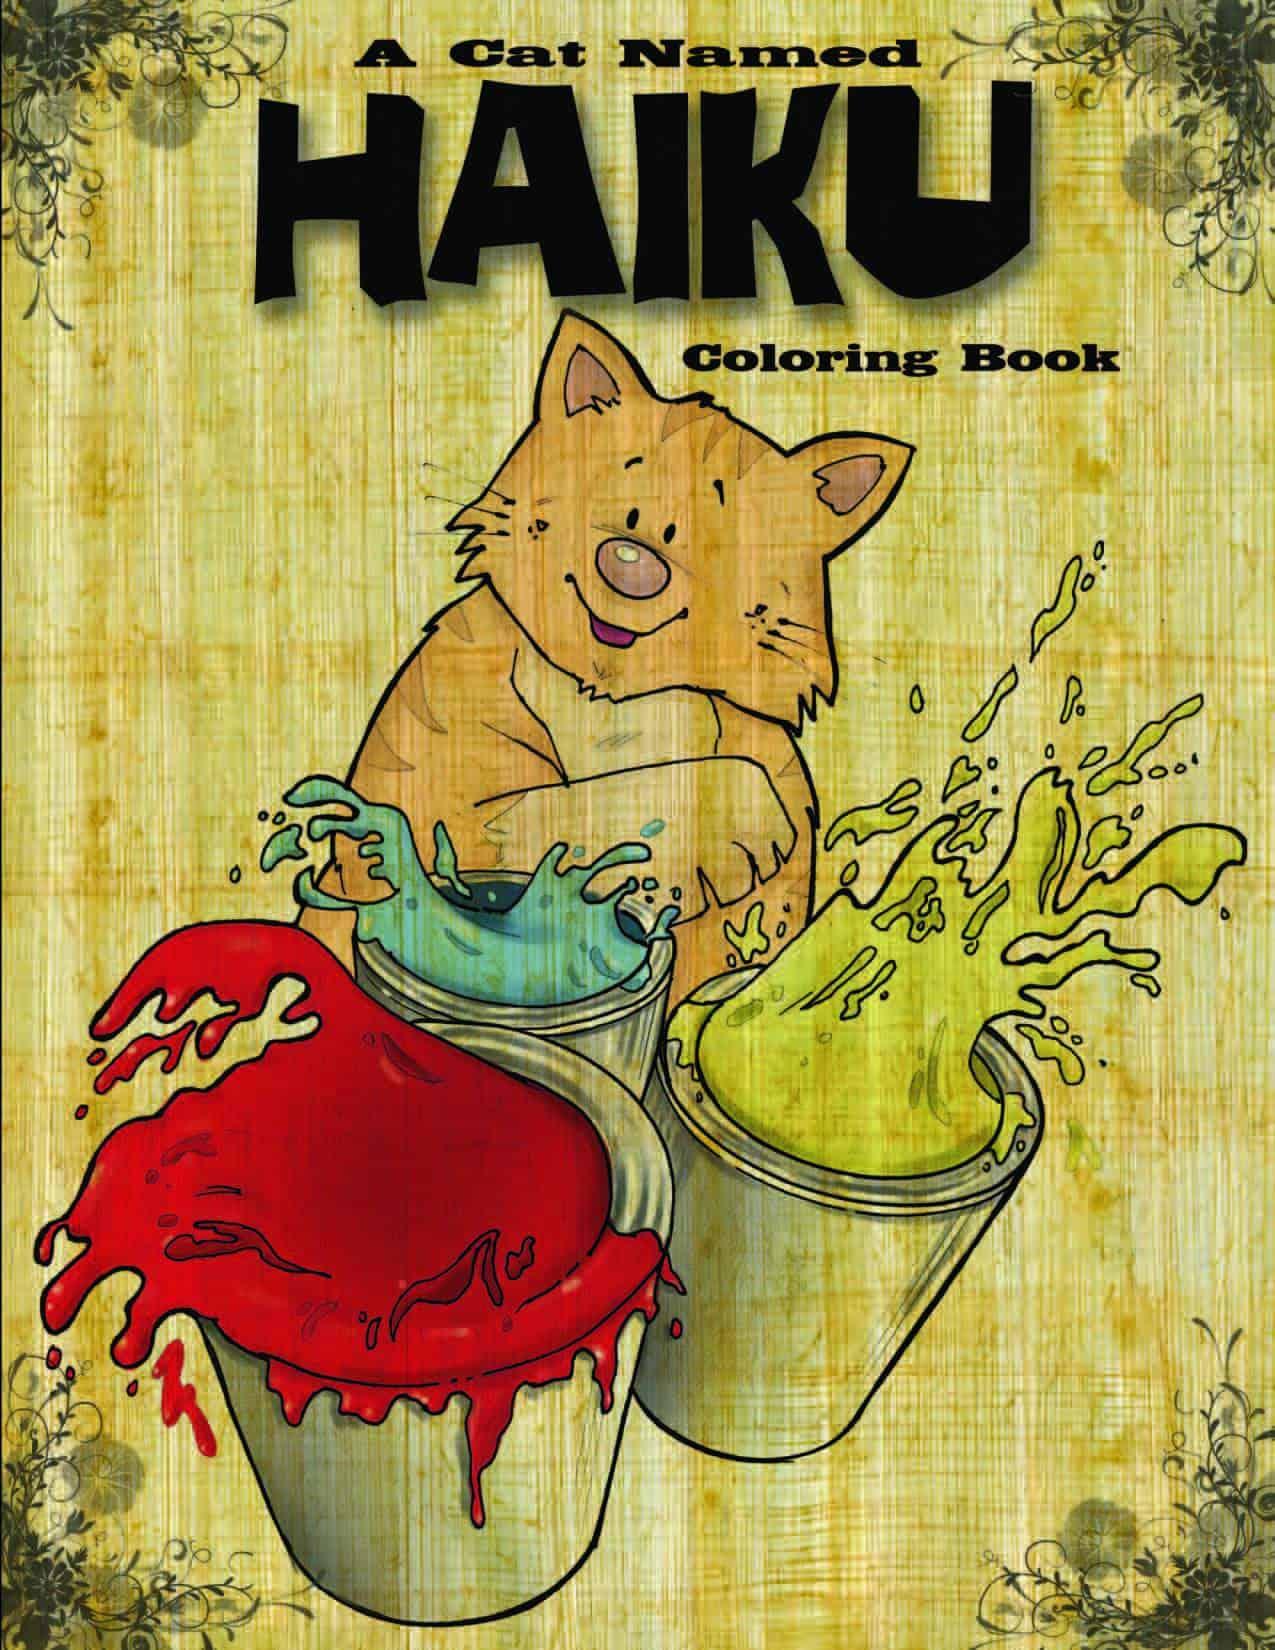 A Cat Named Haiku Coloring Book 2